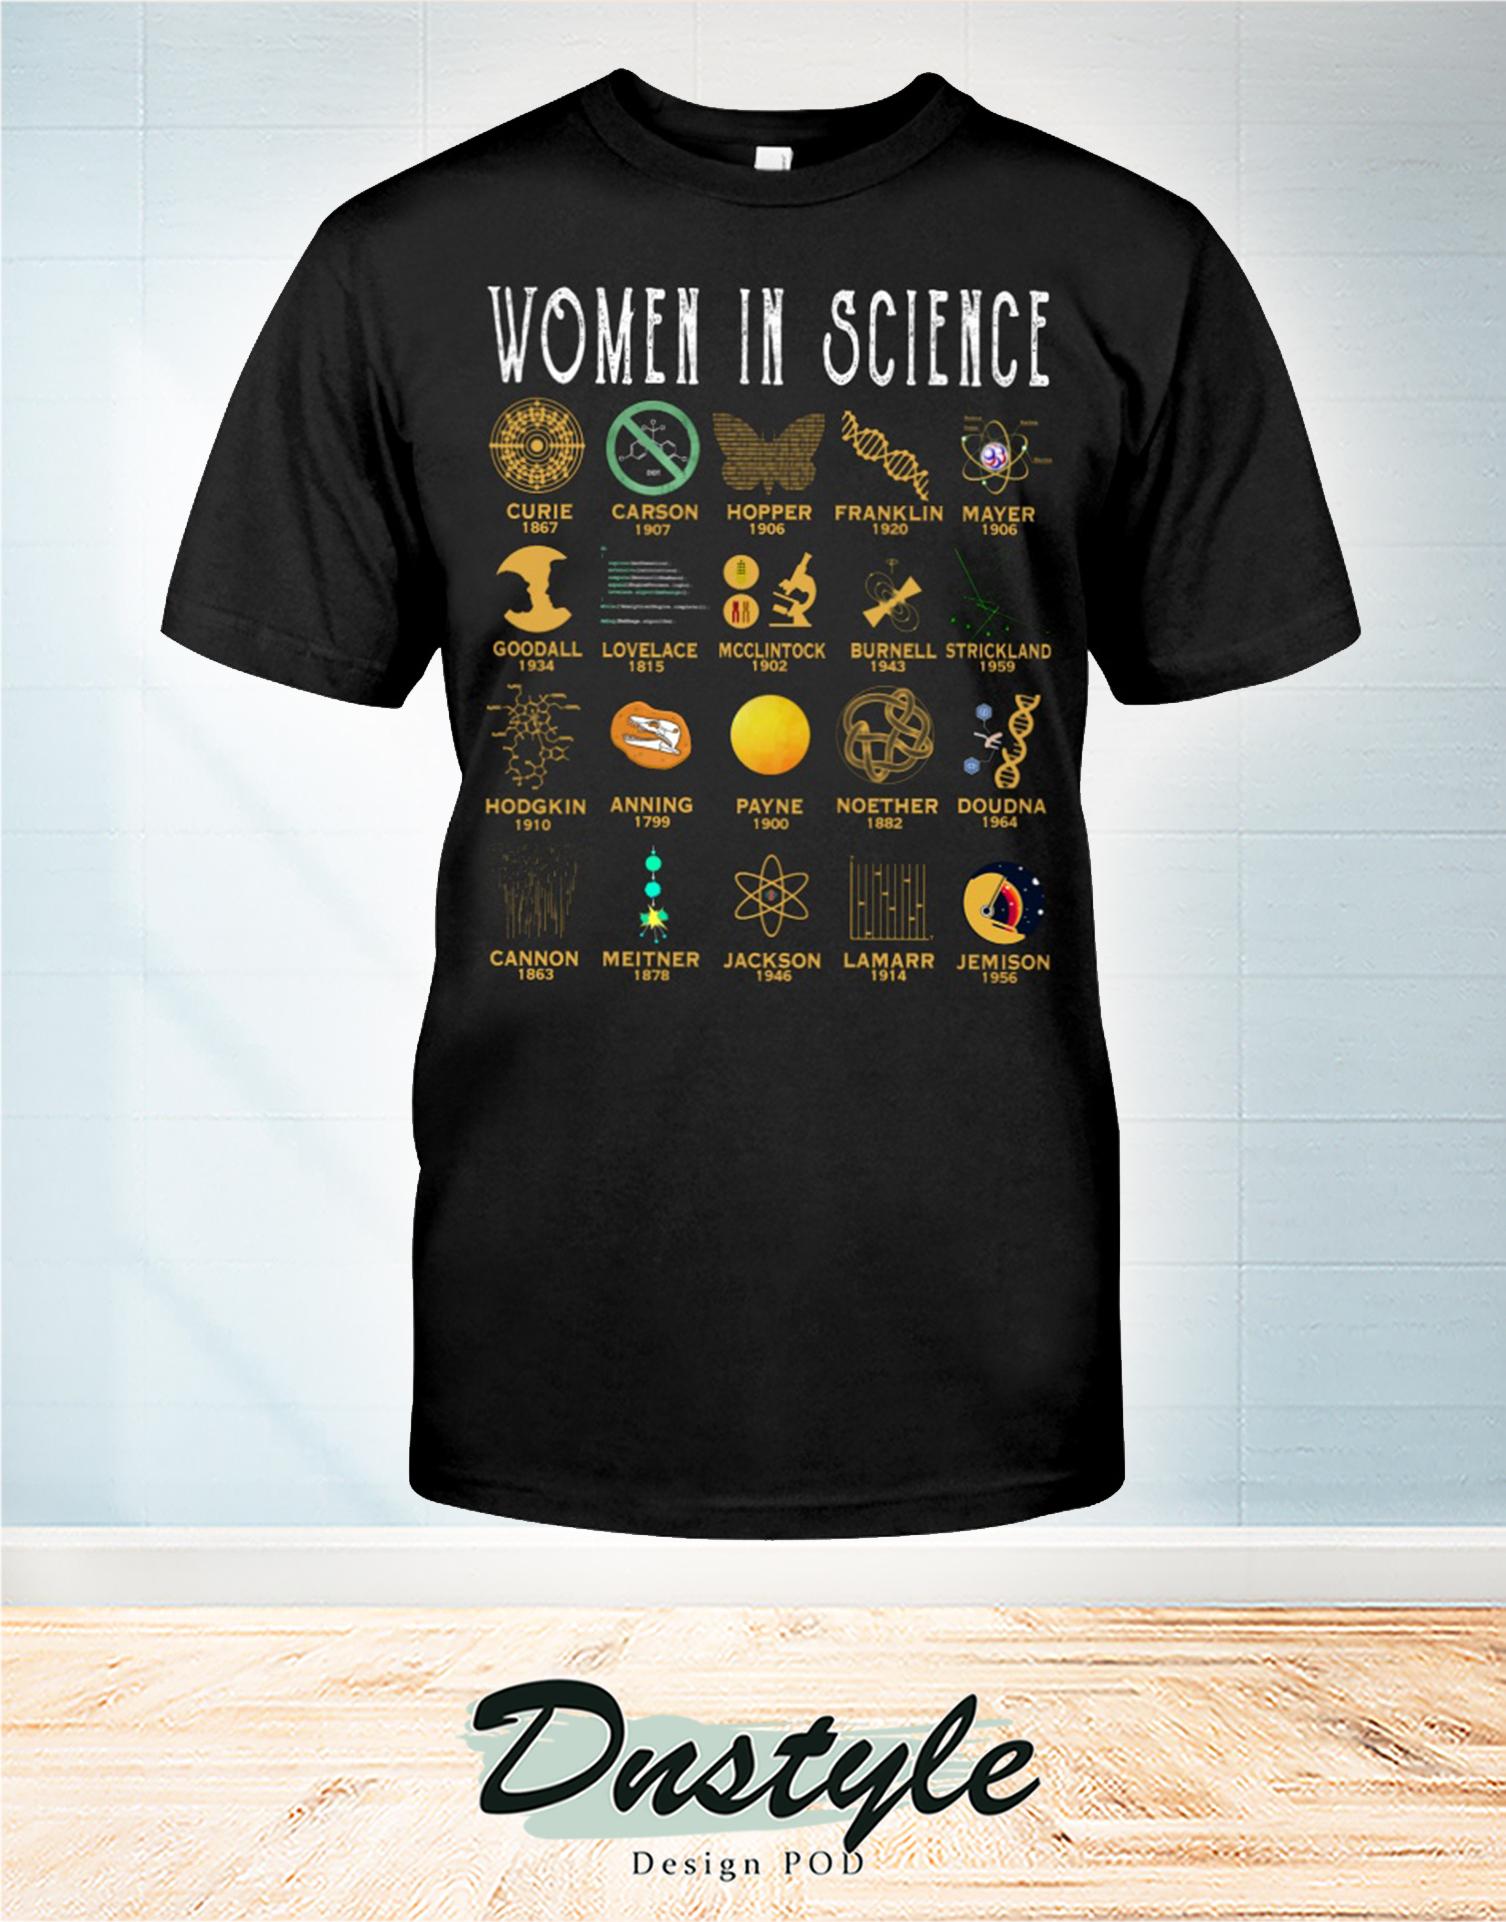 Women in science curie carson hopper frankin mayer t-shirt